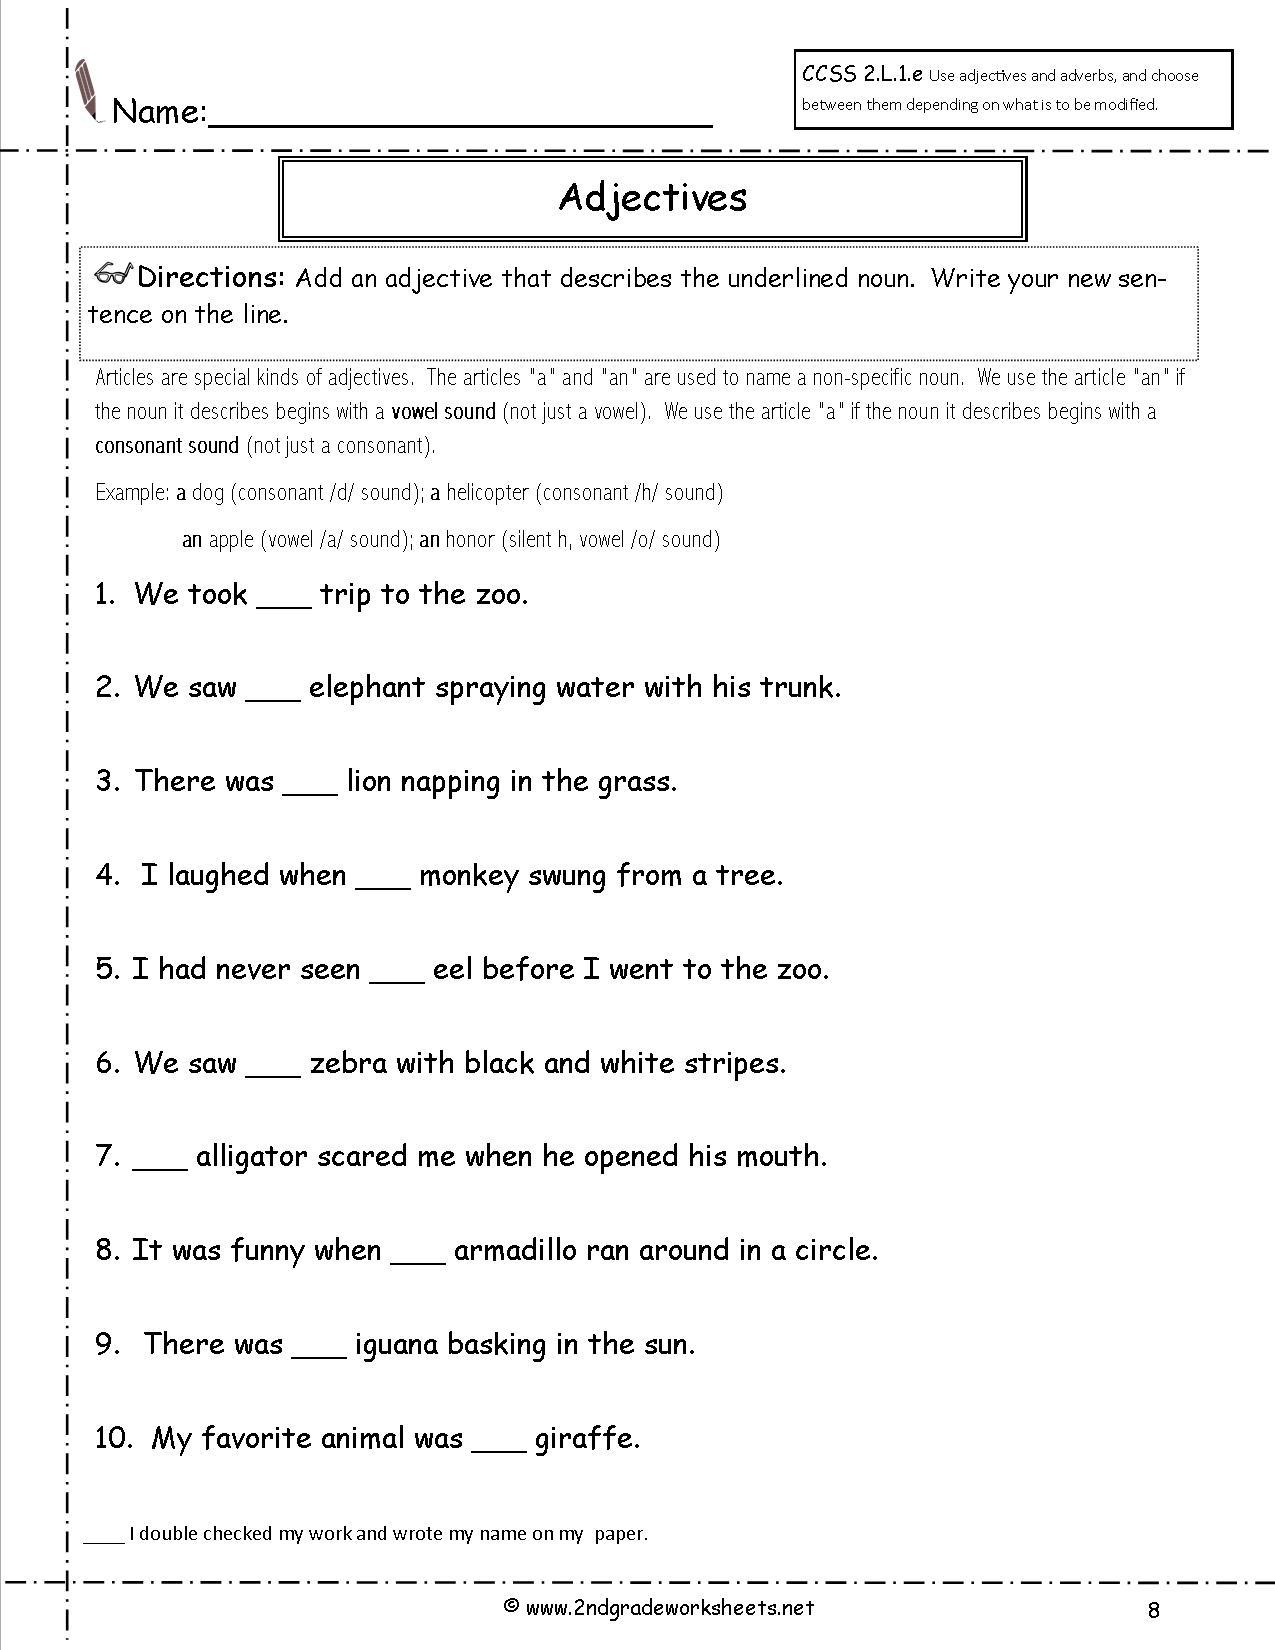 Free Language/grammar Worksheets And Printouts | 3Rd Grade Grammar Worksheets Printable